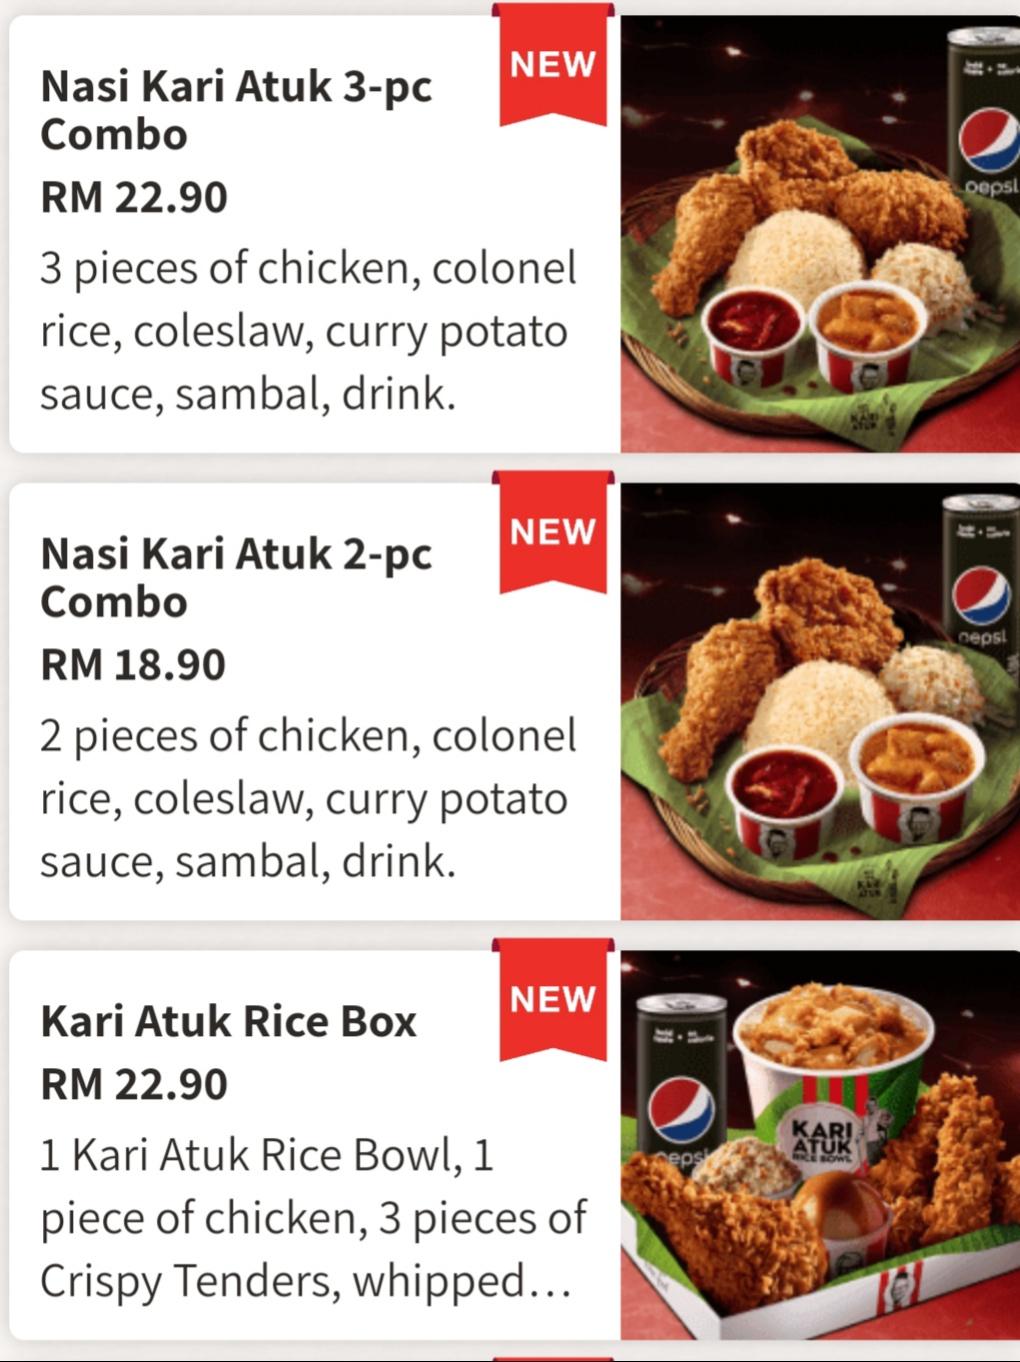 Nasi Kari Atuk KFC